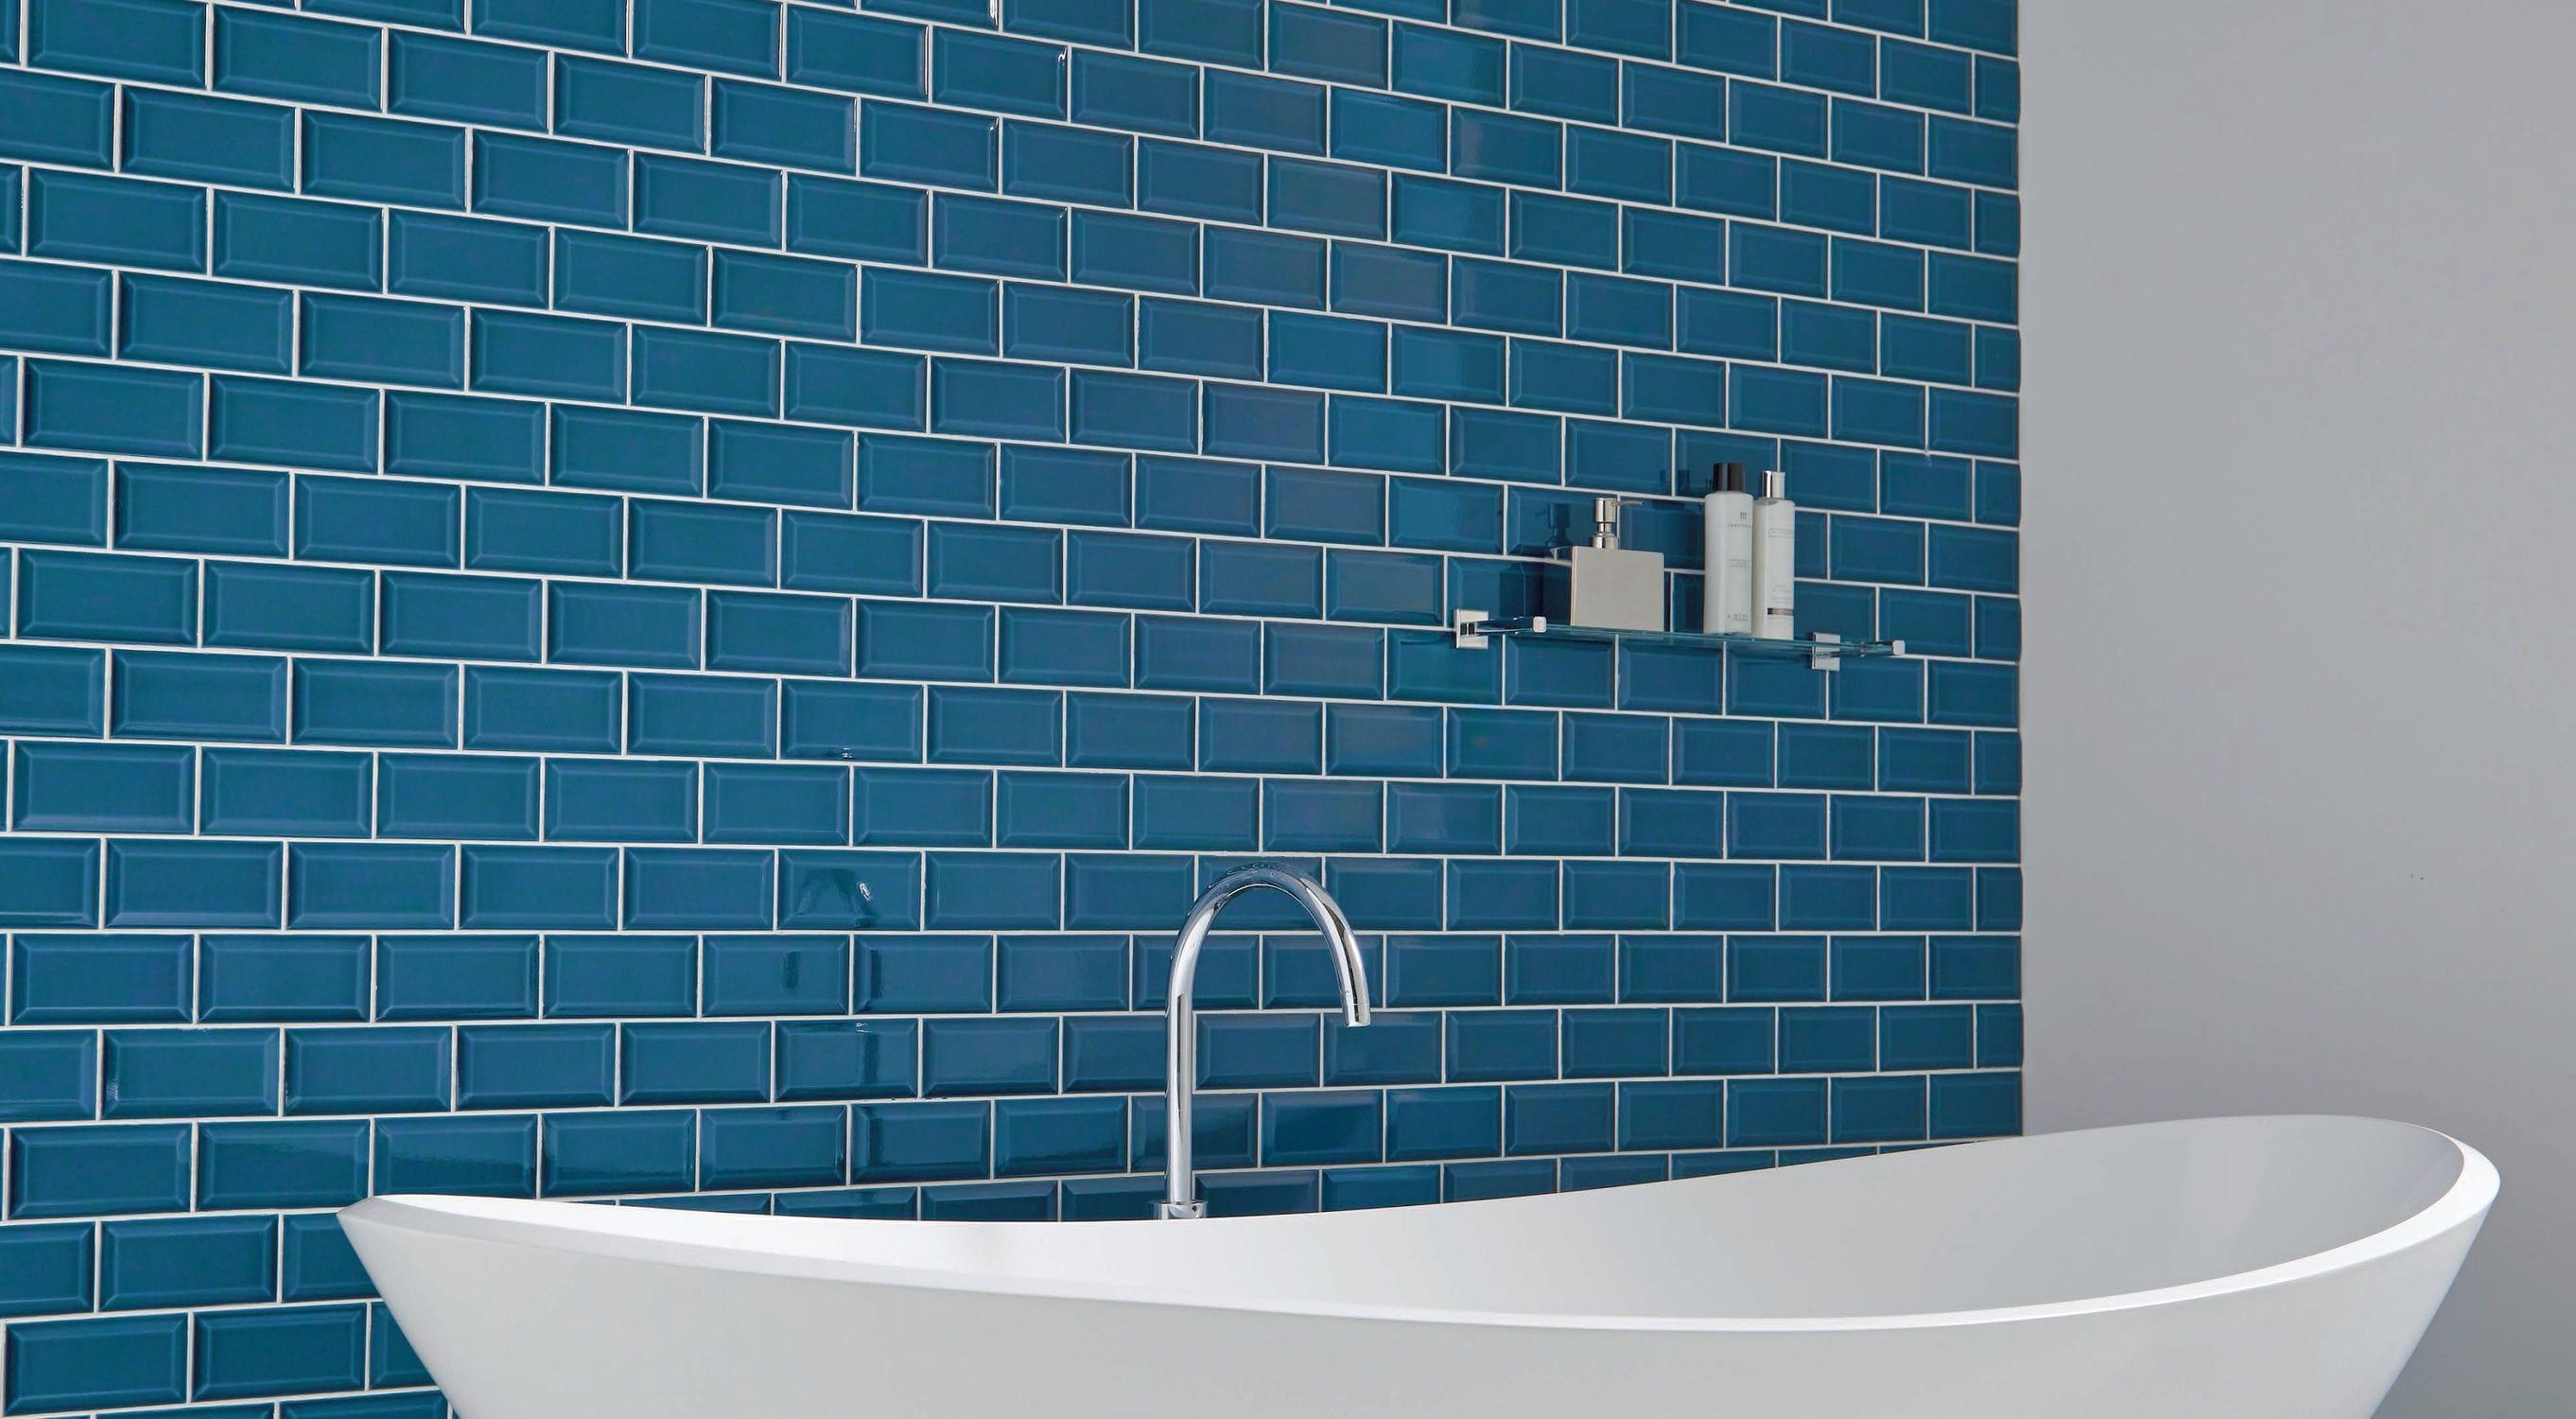 Bathroom tile / kitchen / living room / wall - METRO - CEVICA